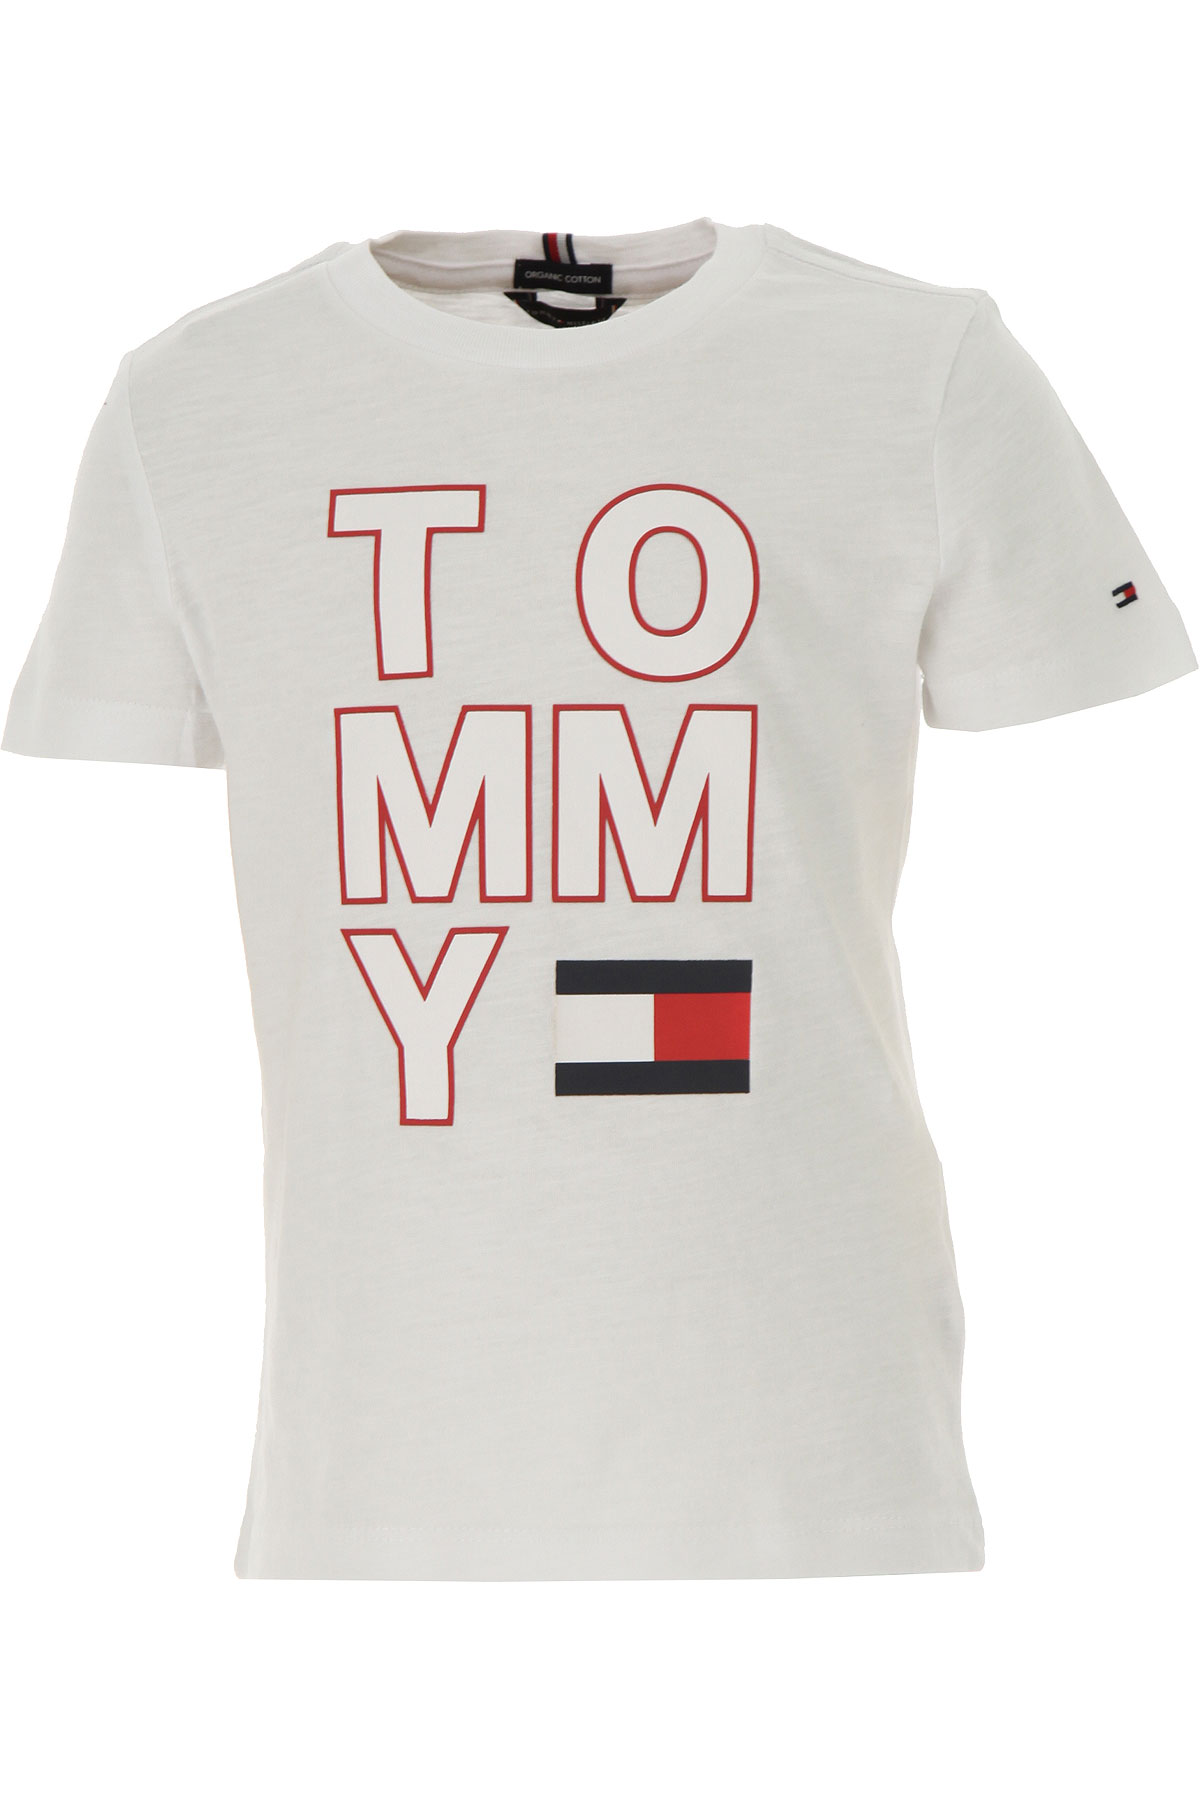 Tommy Hilfiger Kids T-Shirt for Boys On Sale, White, Organic Cotton, 2019, 12Y 4Y 8Y